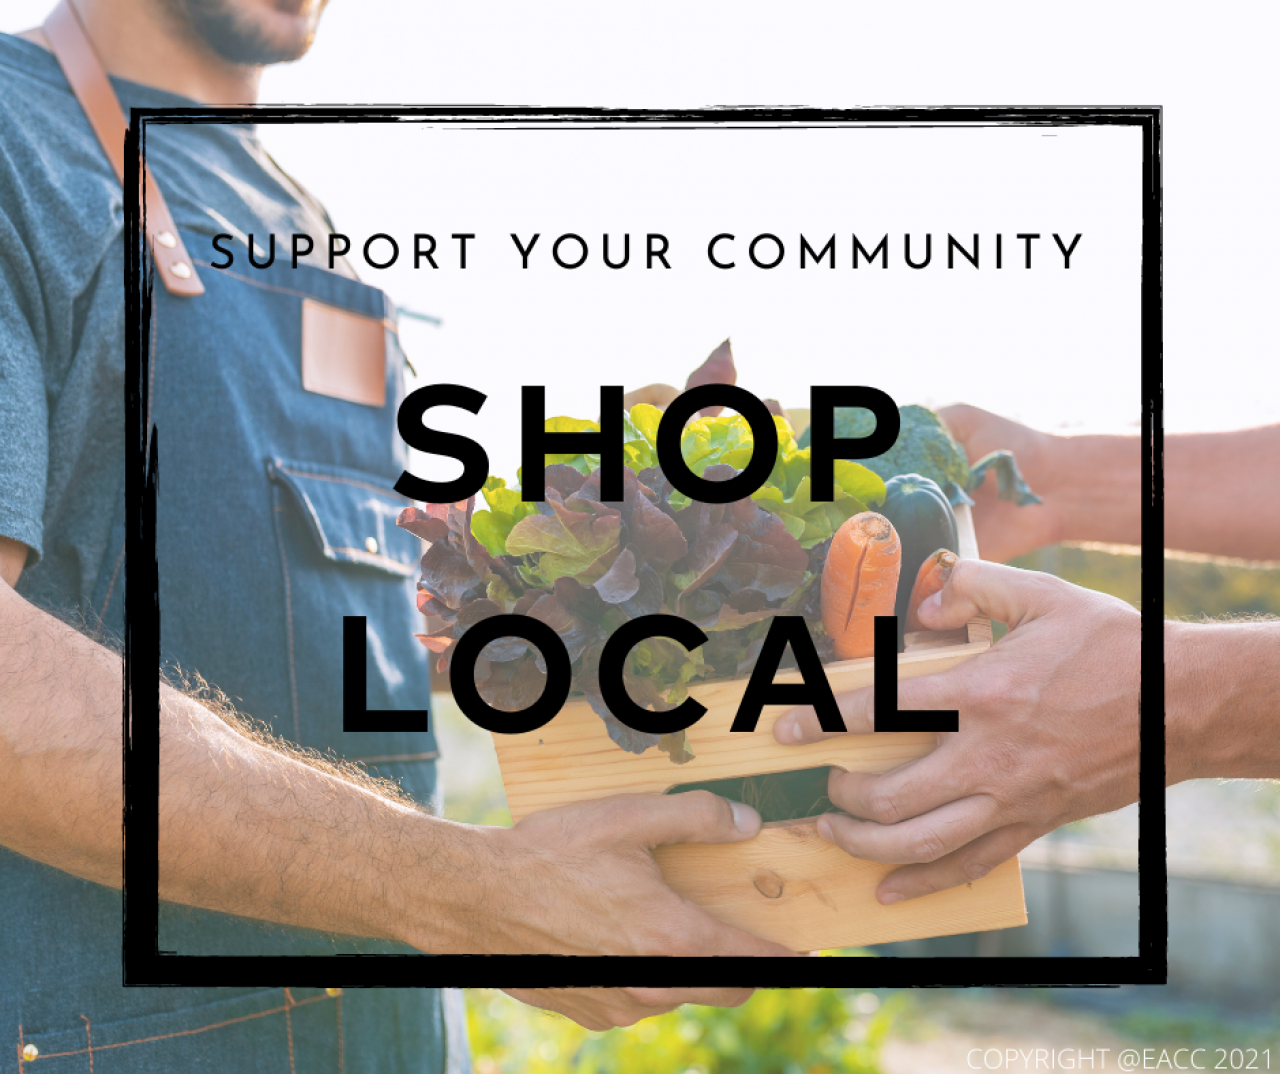 >Three Good Reasons to Shop Local